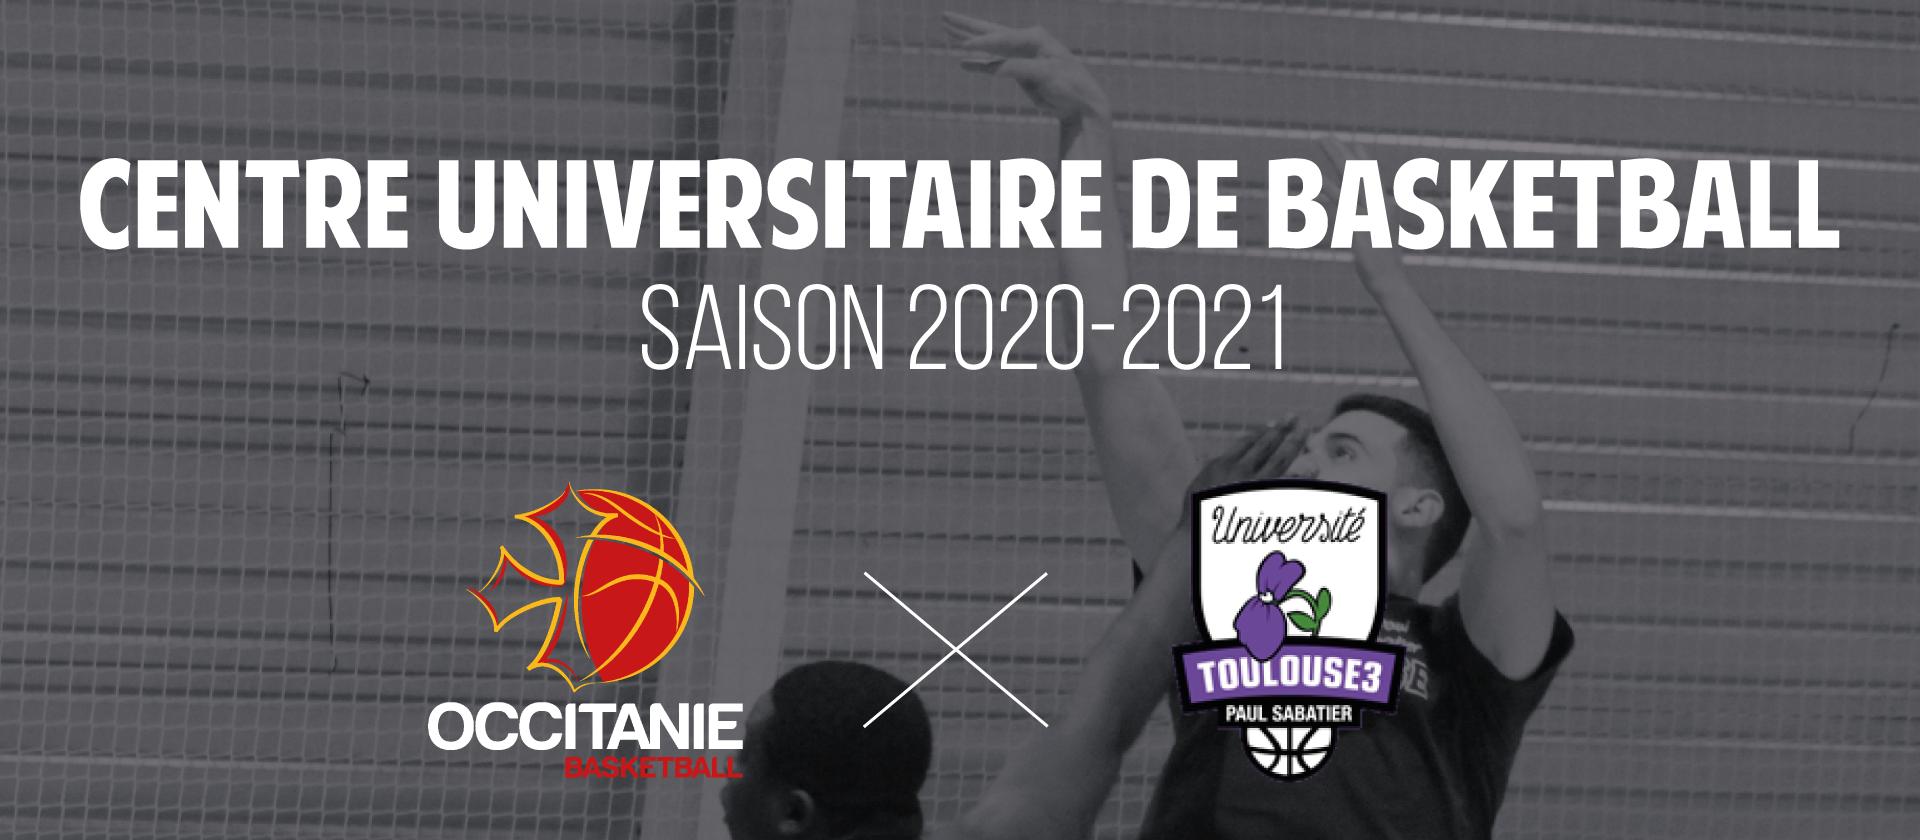 C.U.B 2020 2021   Occitanie Basketball